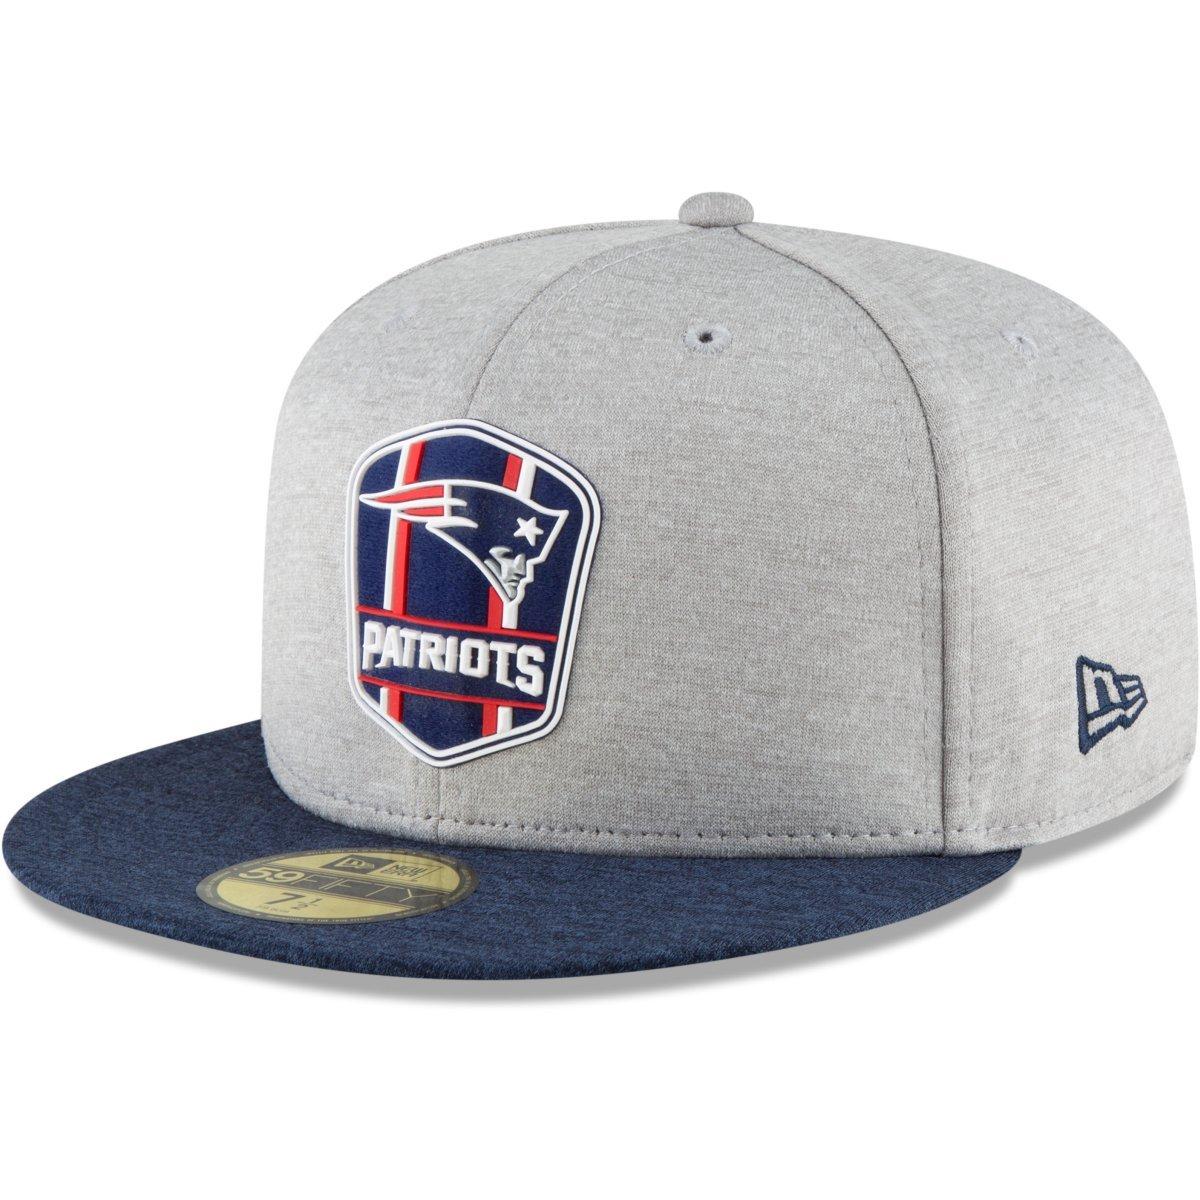 New Era 59Fifty Cap PLATINUM Sideline New England Patriots